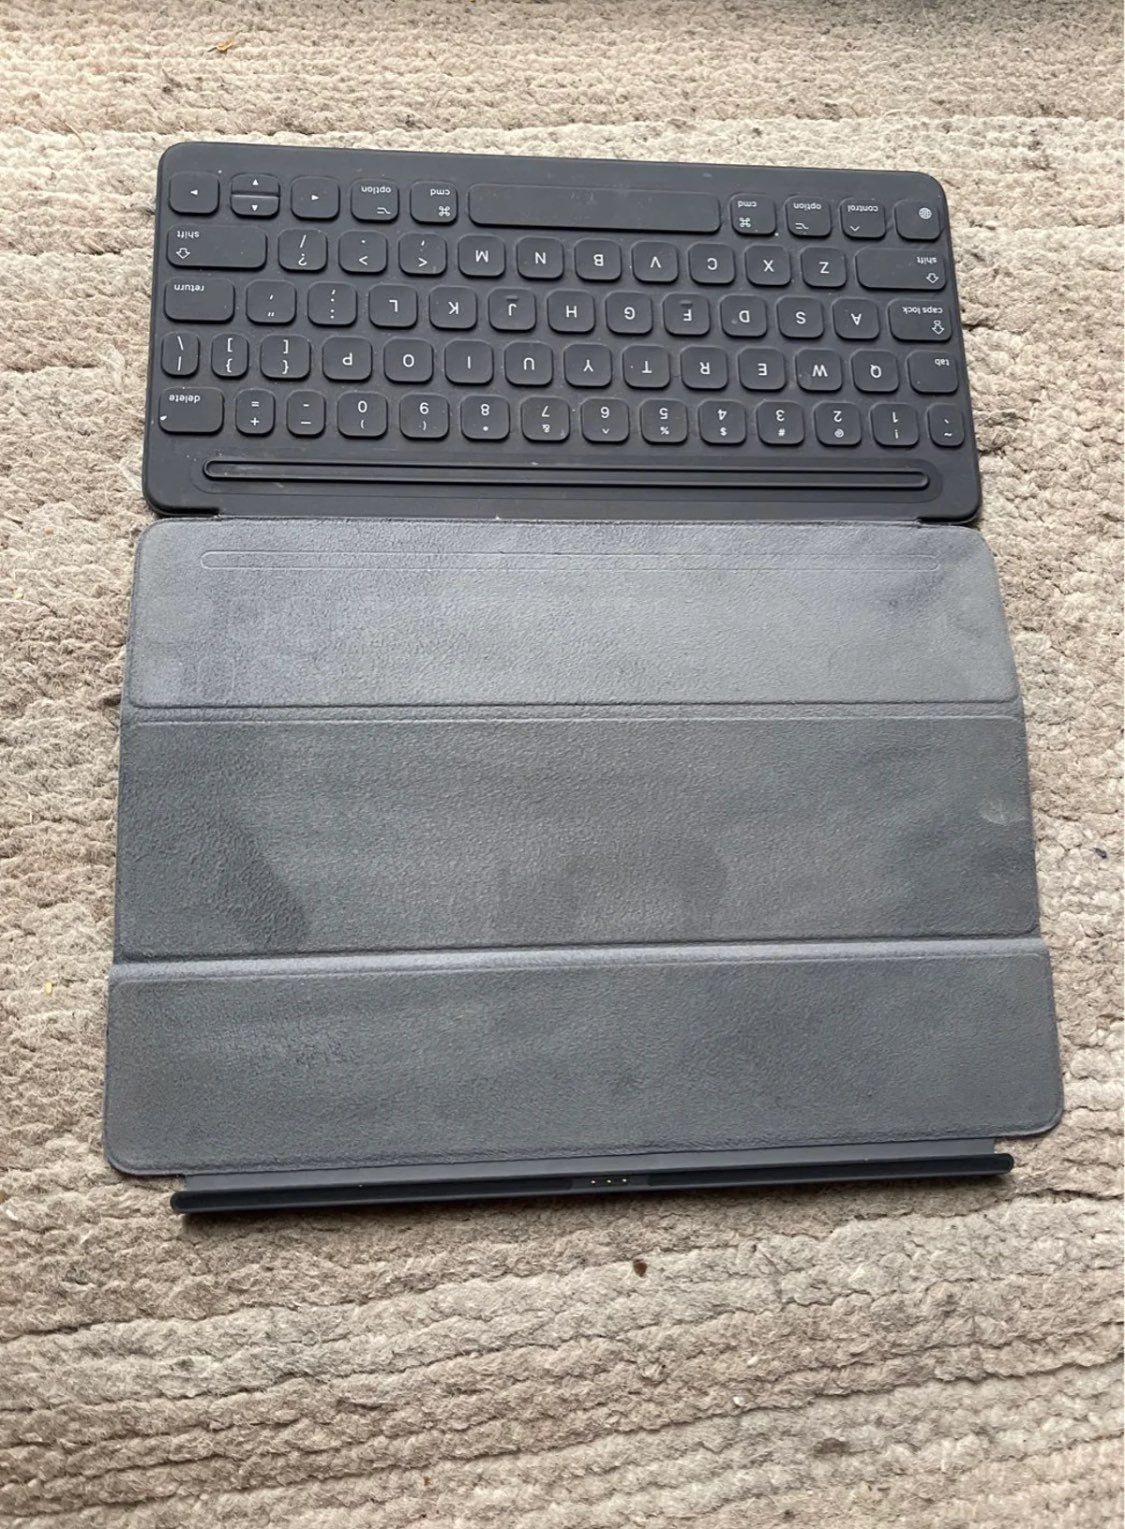 Apple A1829 Smart Keyboard cover